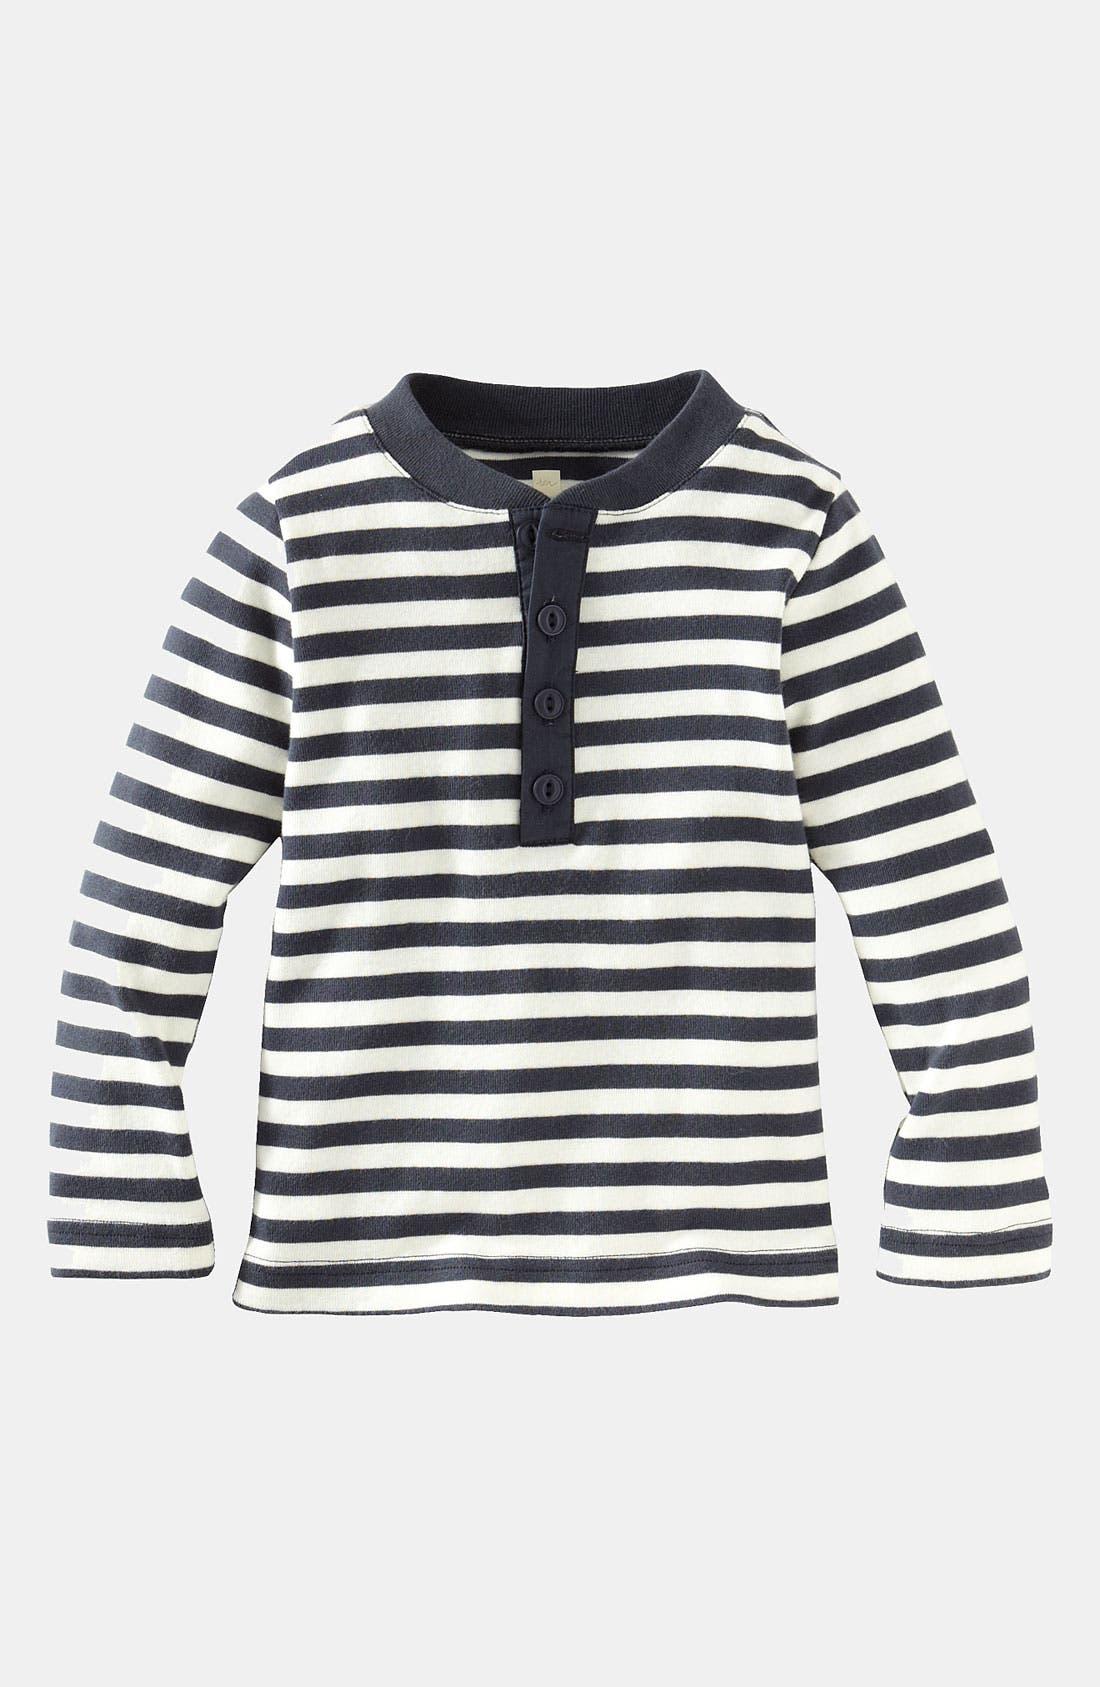 Main Image - Tea Collection 'Vilakazi' Henley Shirt (Infant)